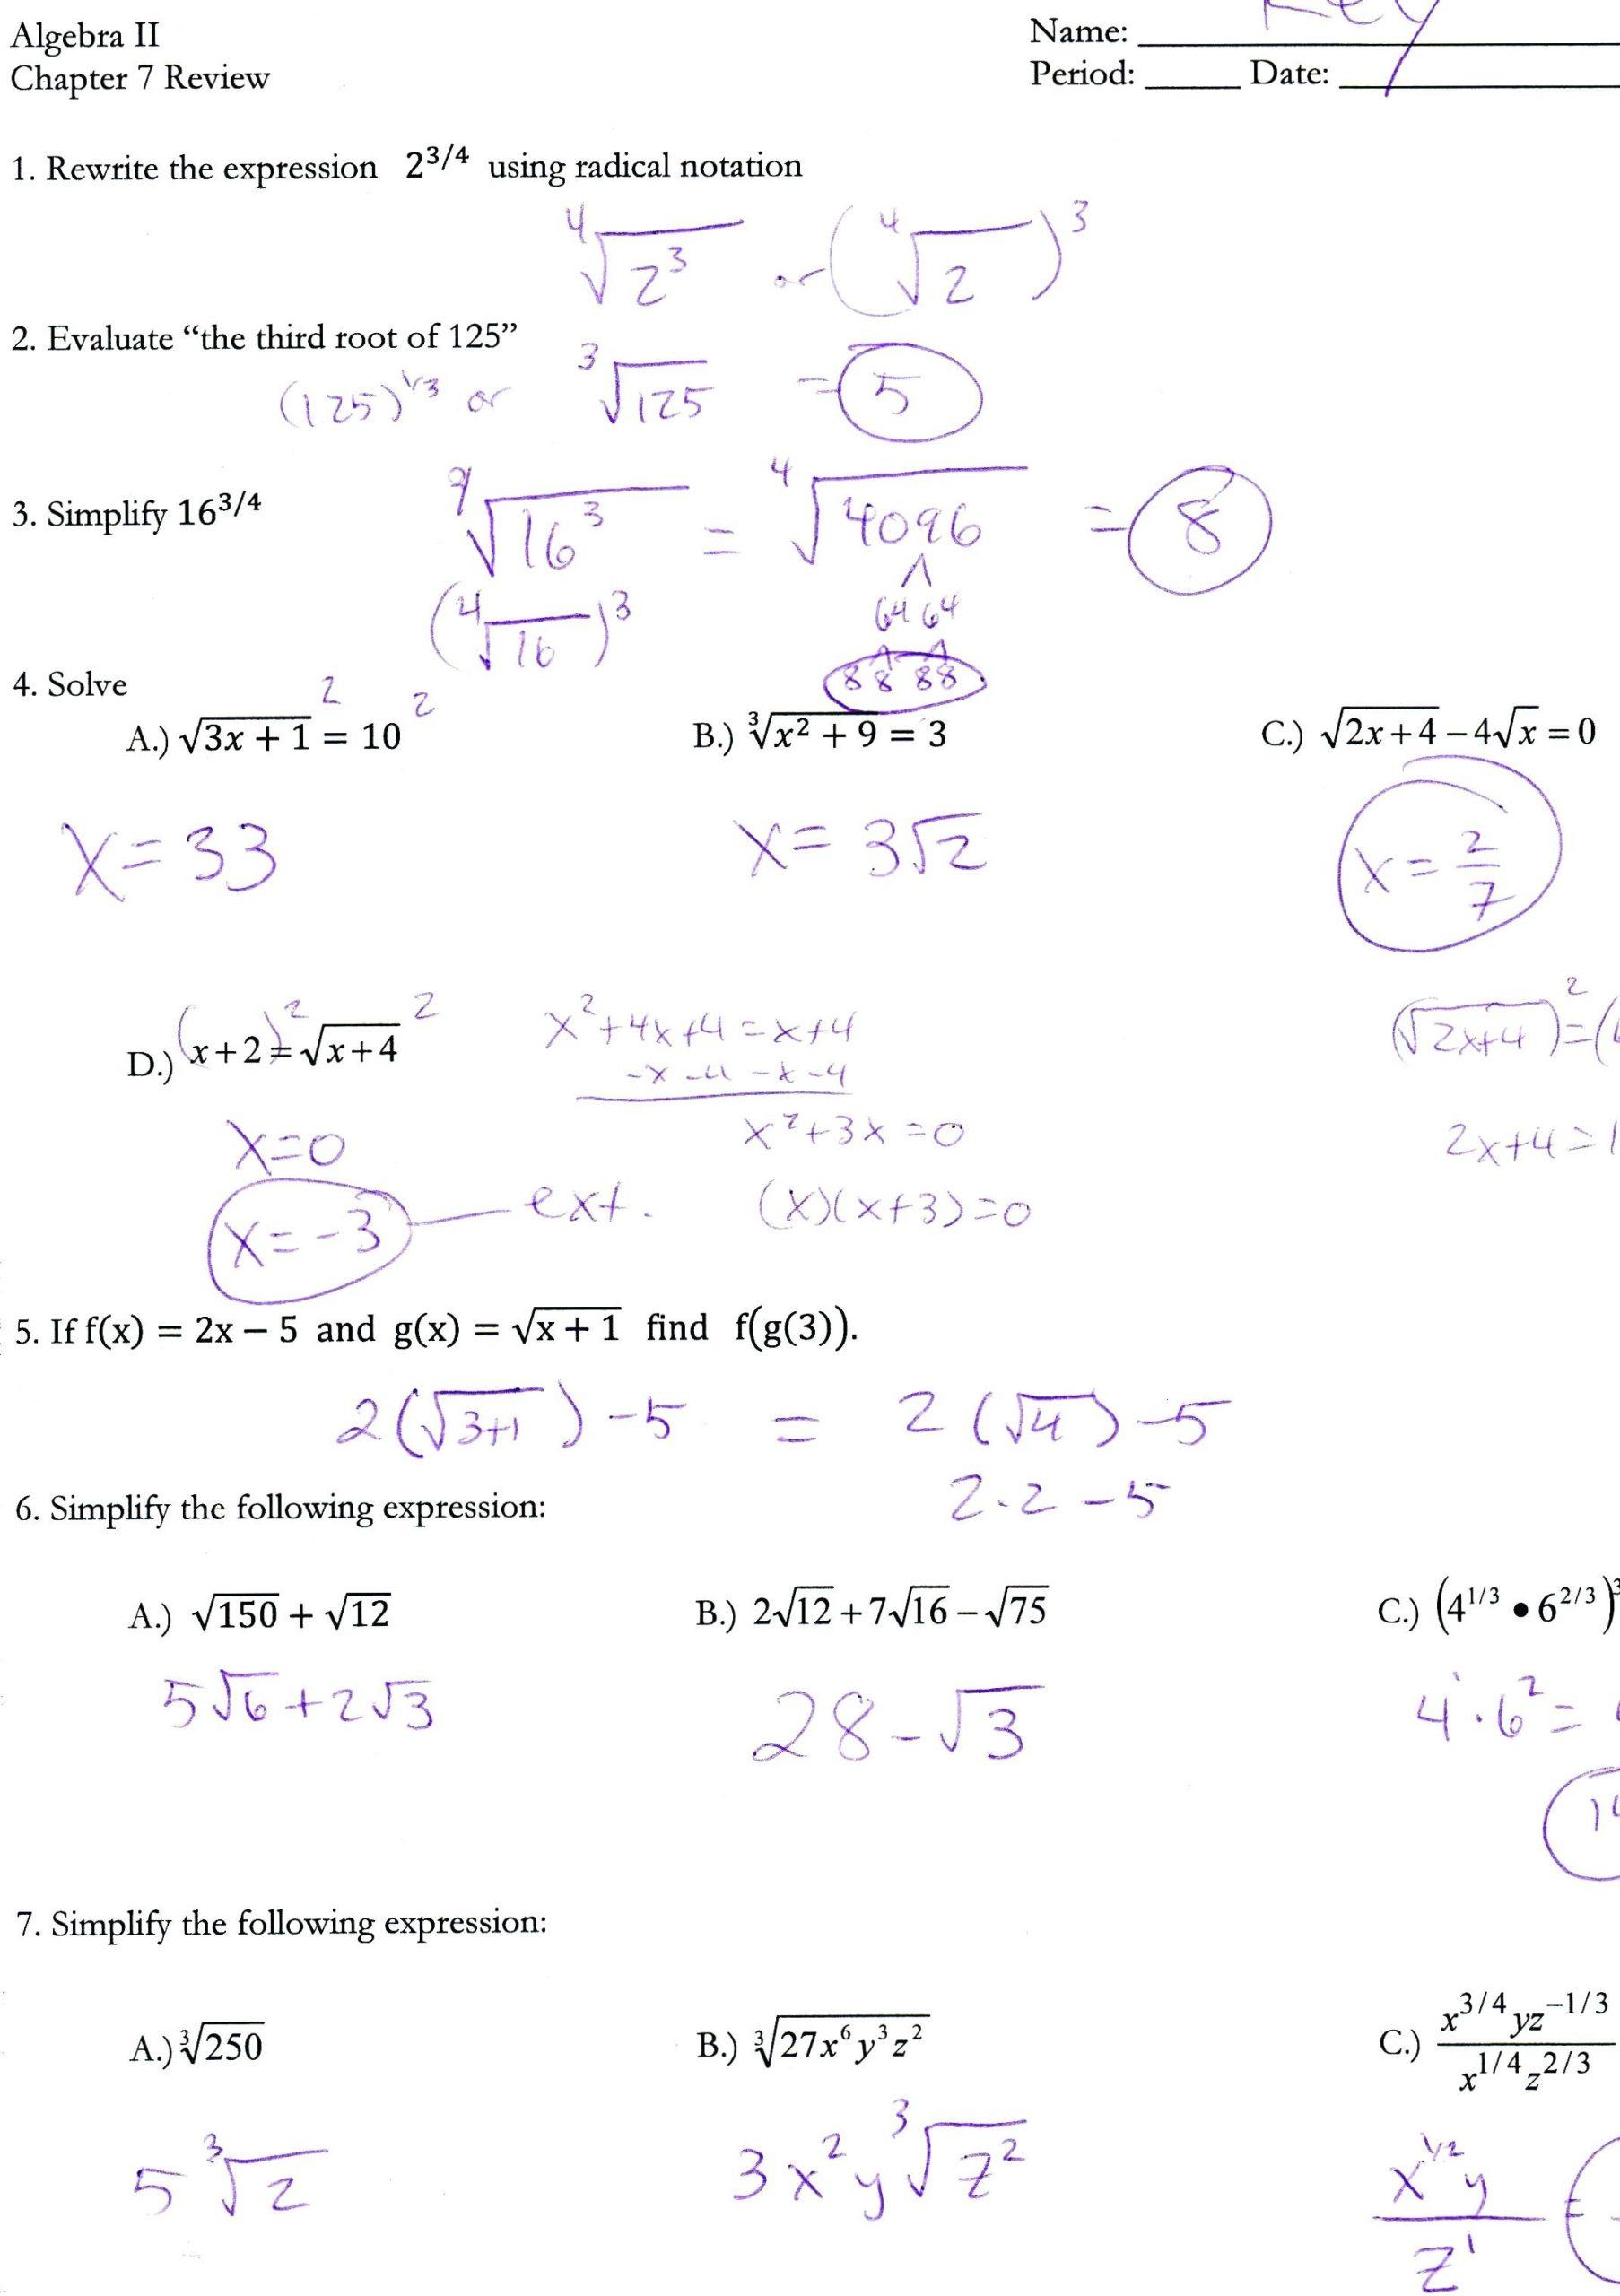 30 Simplifying Radicals Worksheet Algebra 2